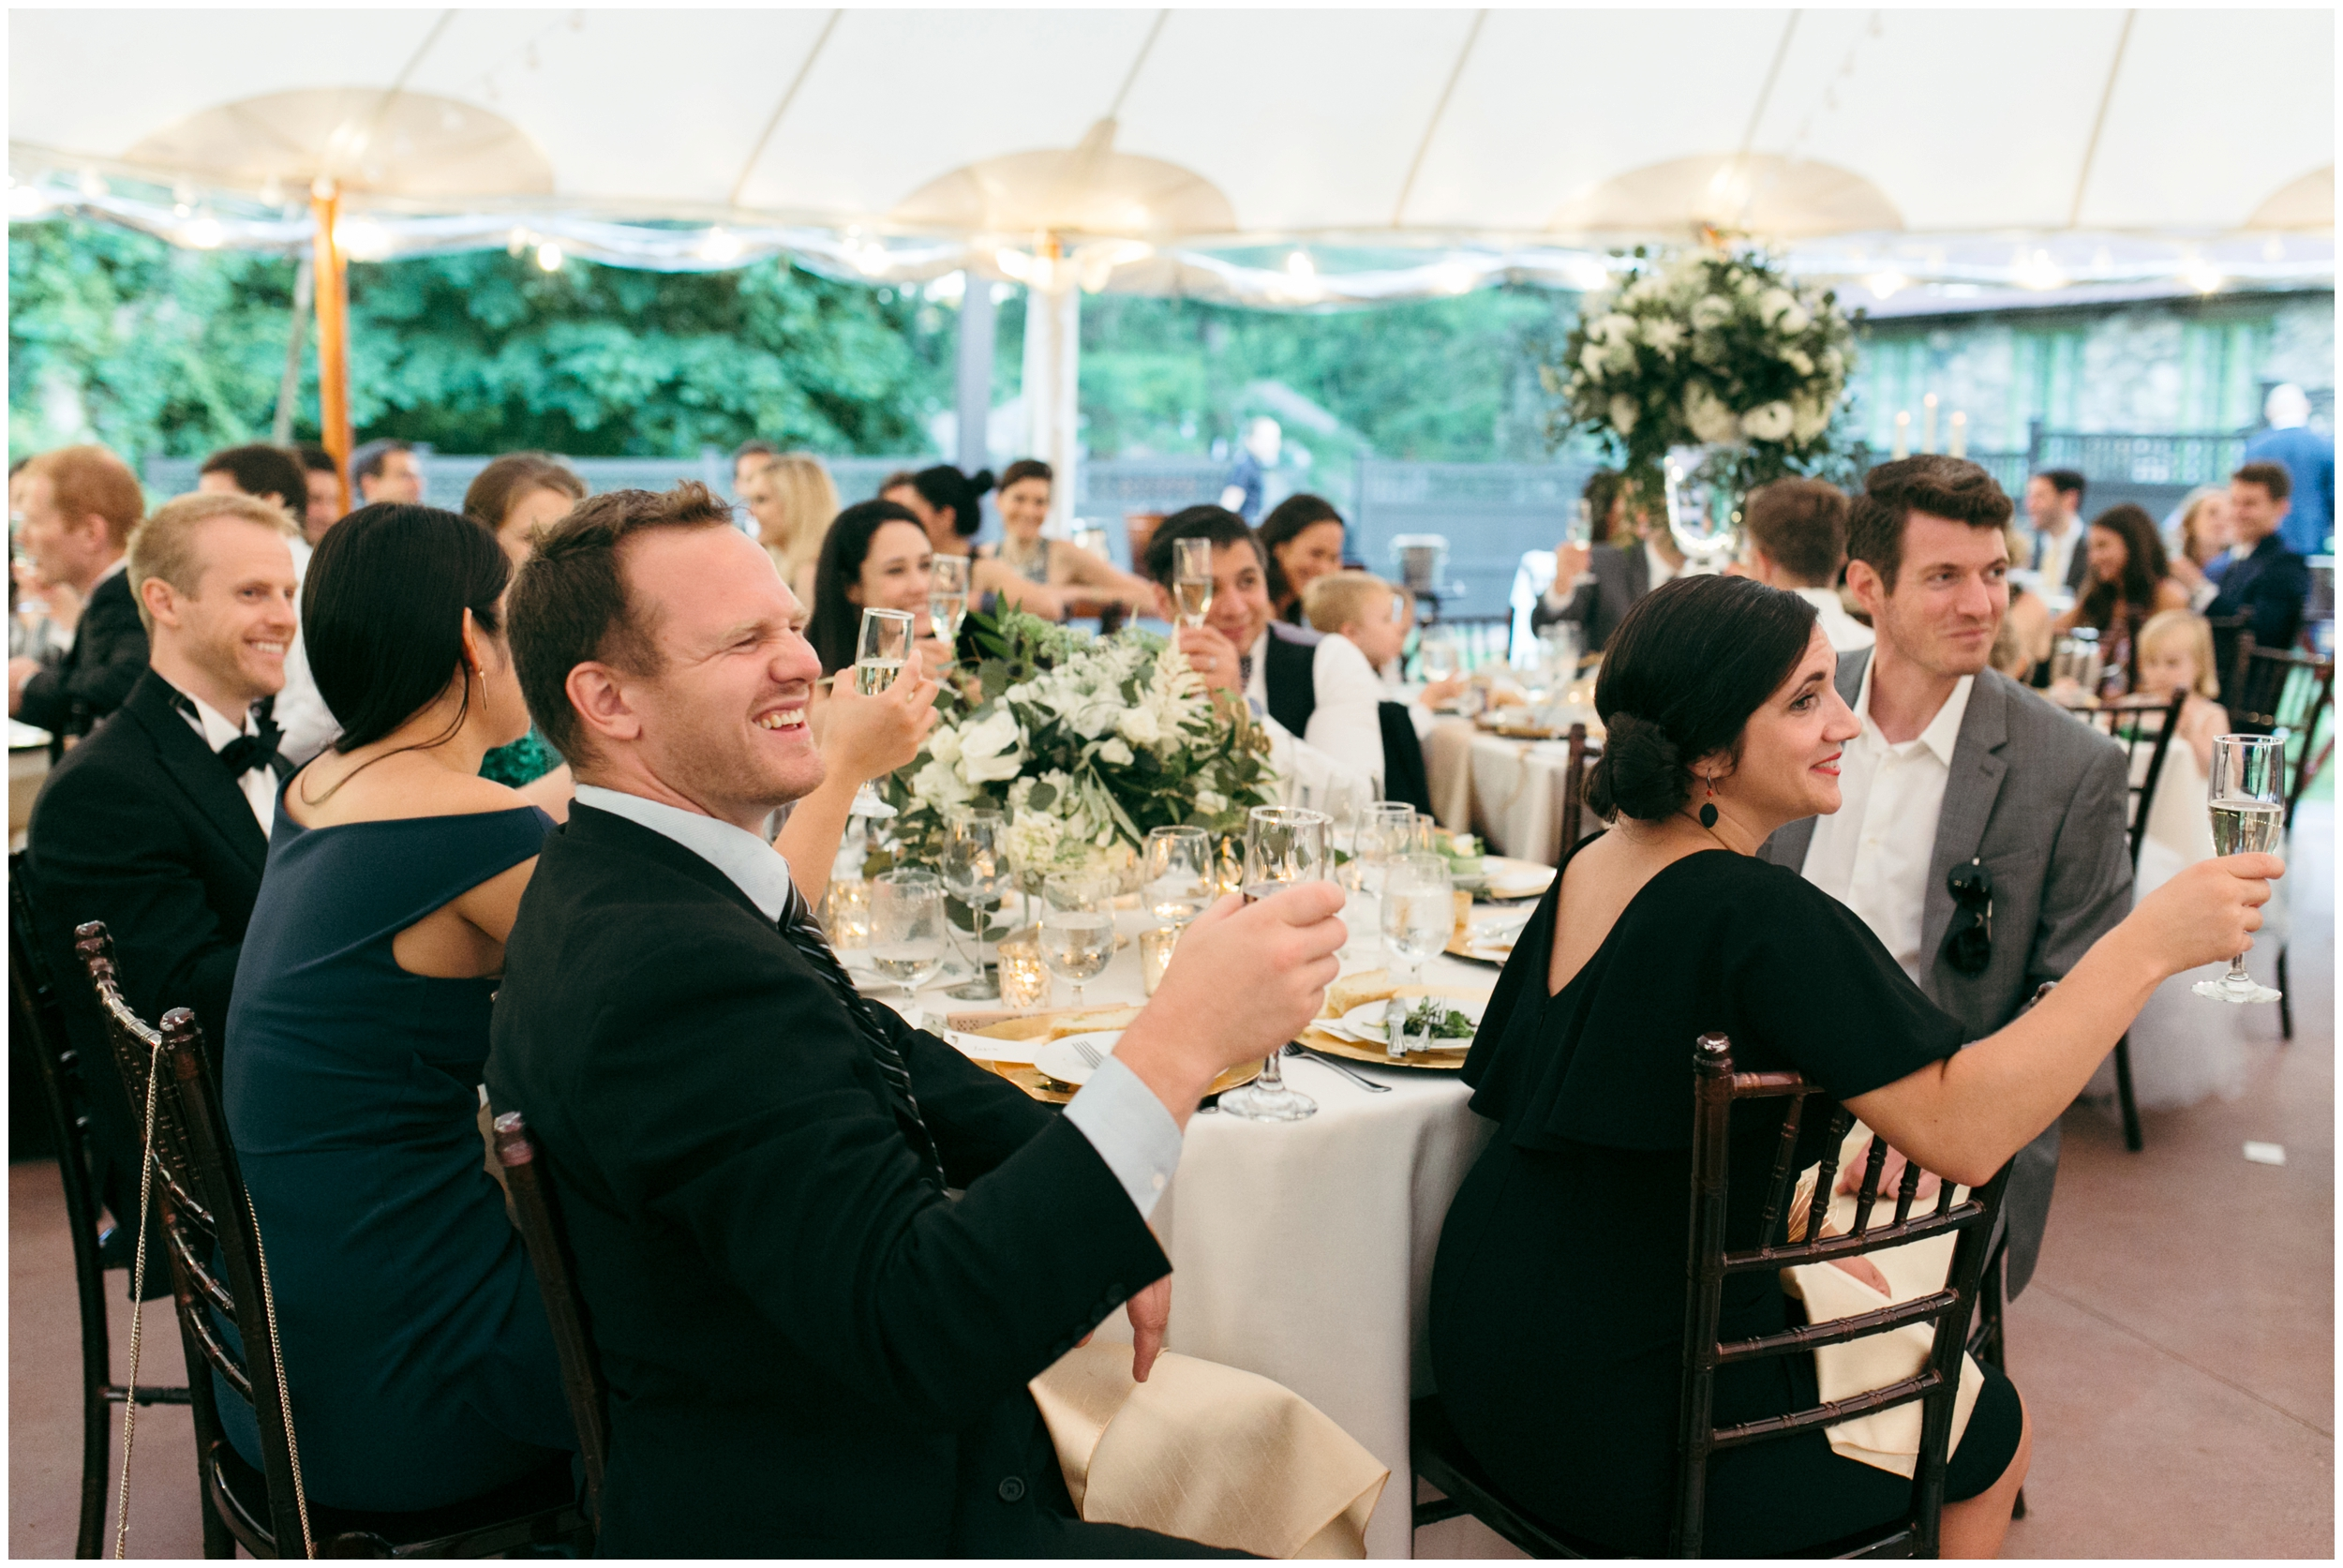 Willowdale-Estate-Wedding-Bailey-Q-Photo-Boston-Wedding-Photographer-089.JPG